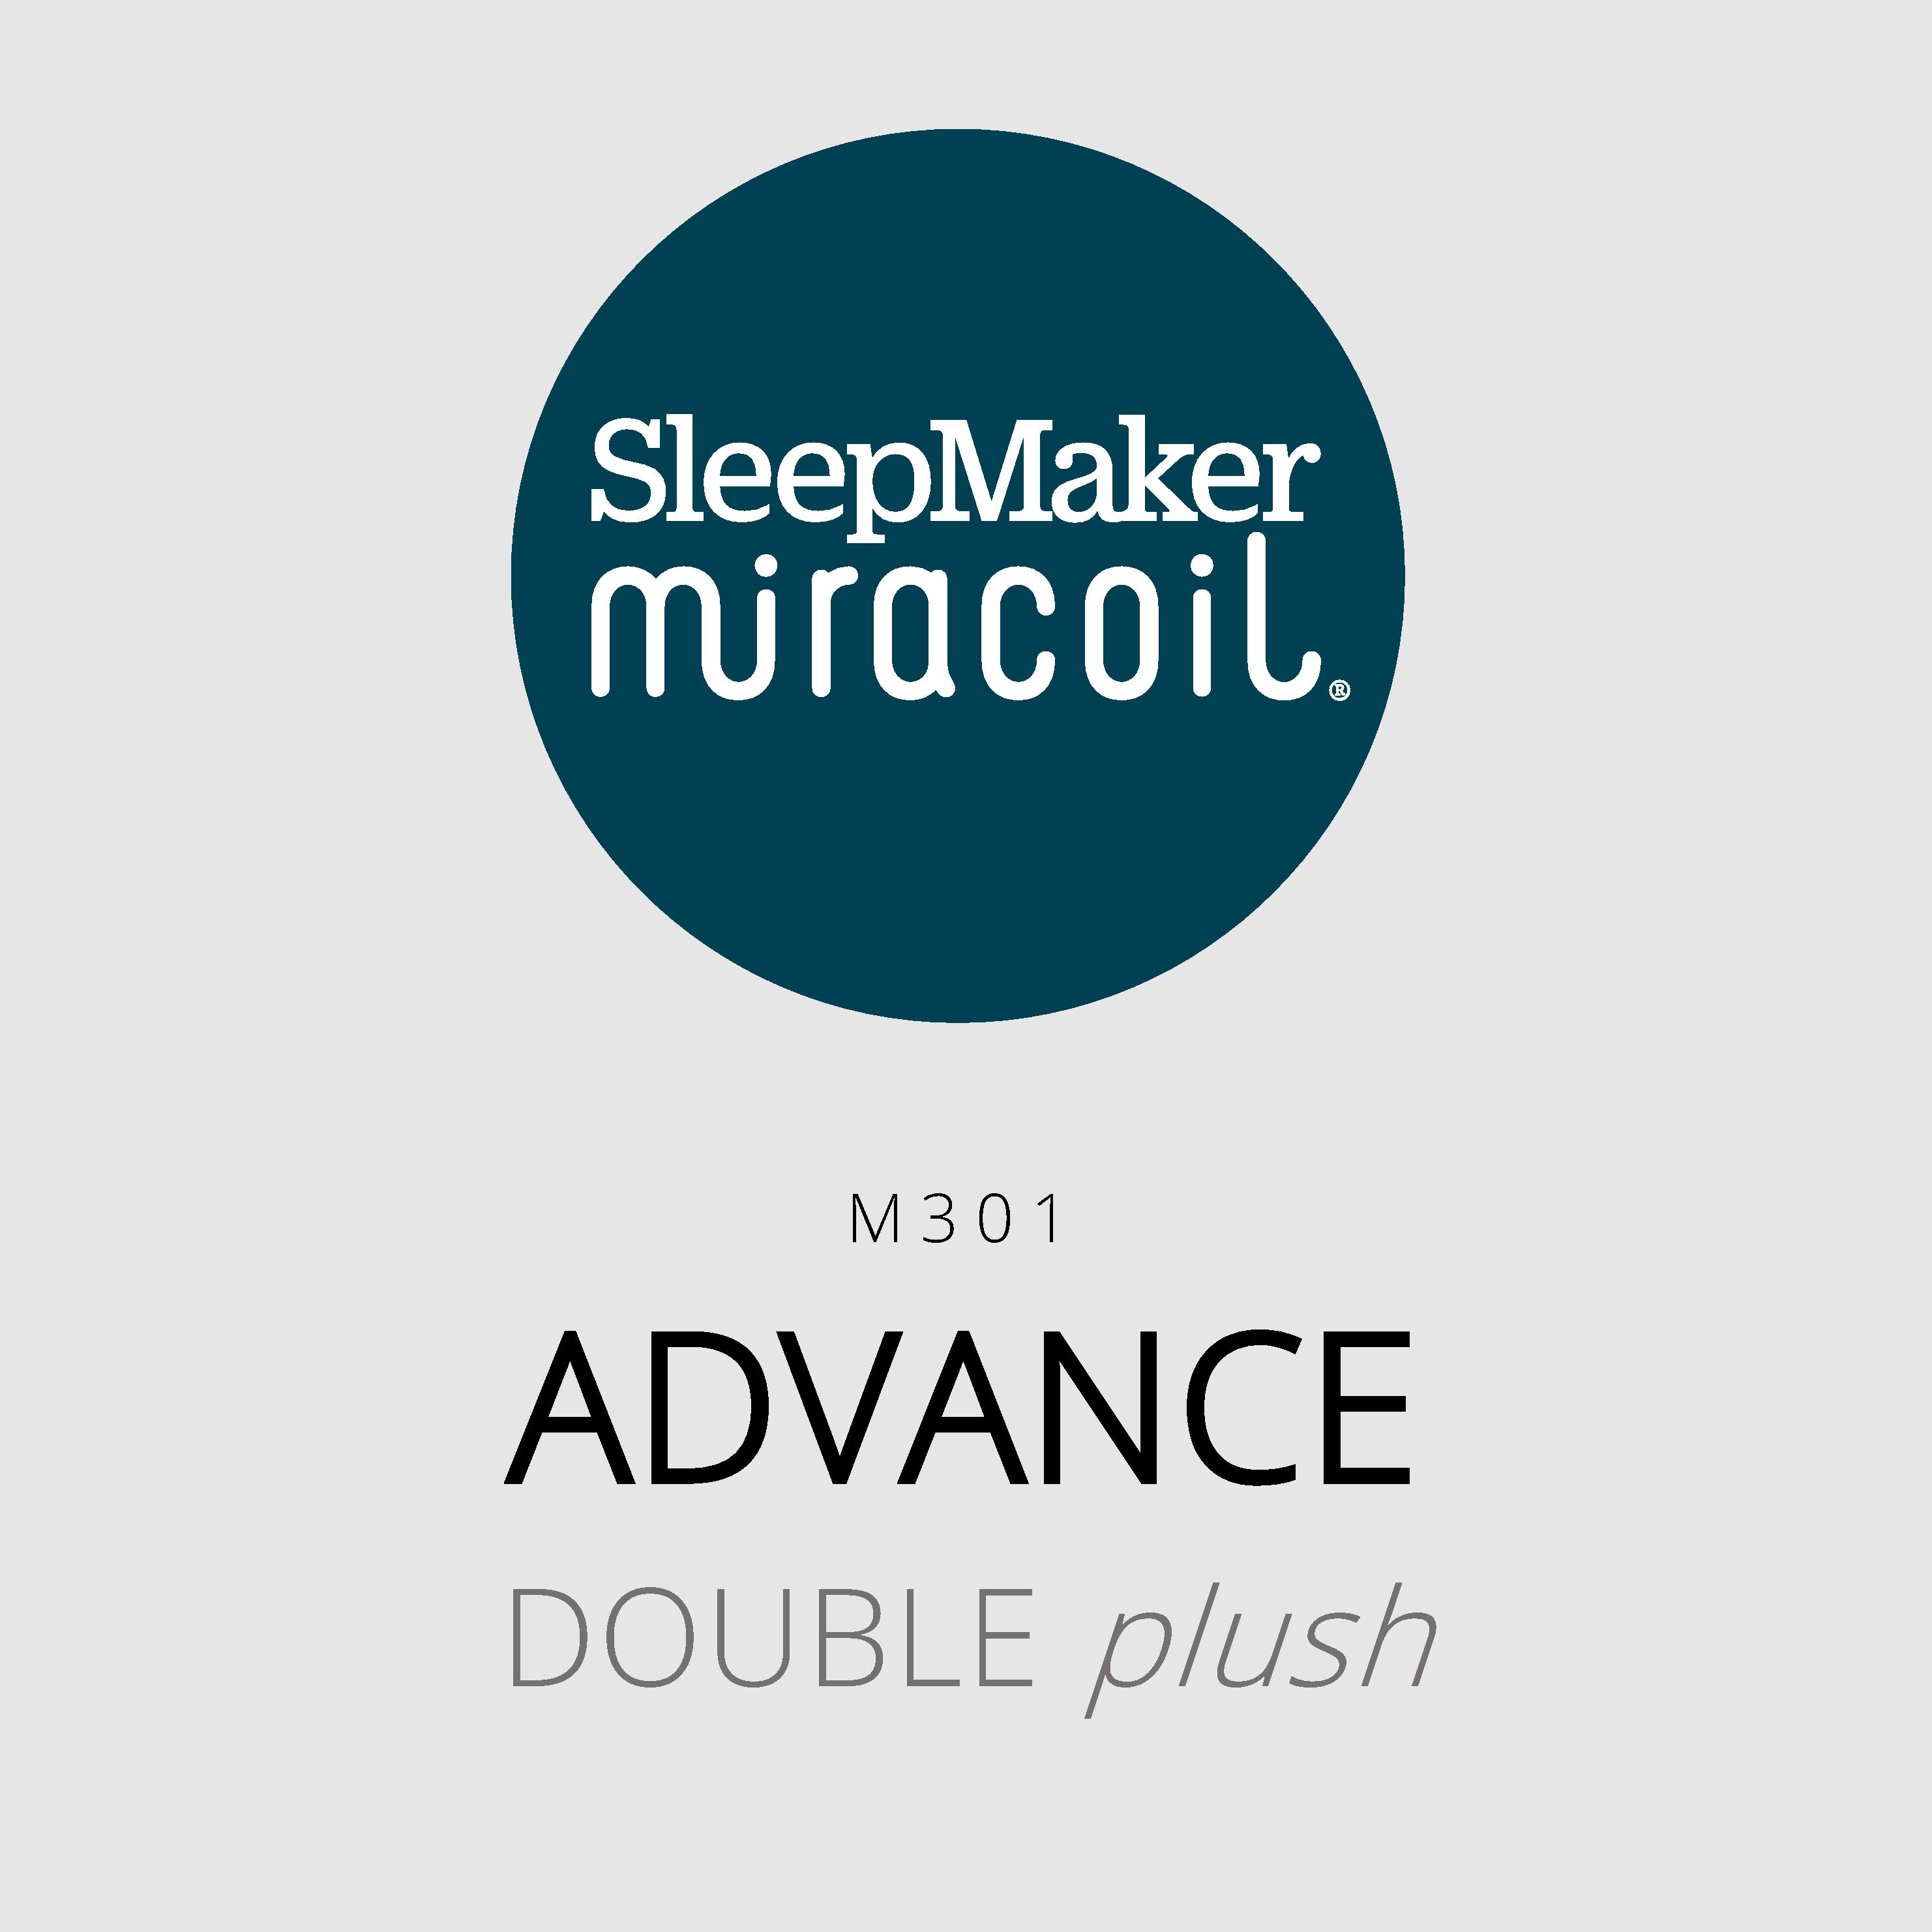 SleepMaker Miracoil – Advance – M301 – Double Plush Mattress